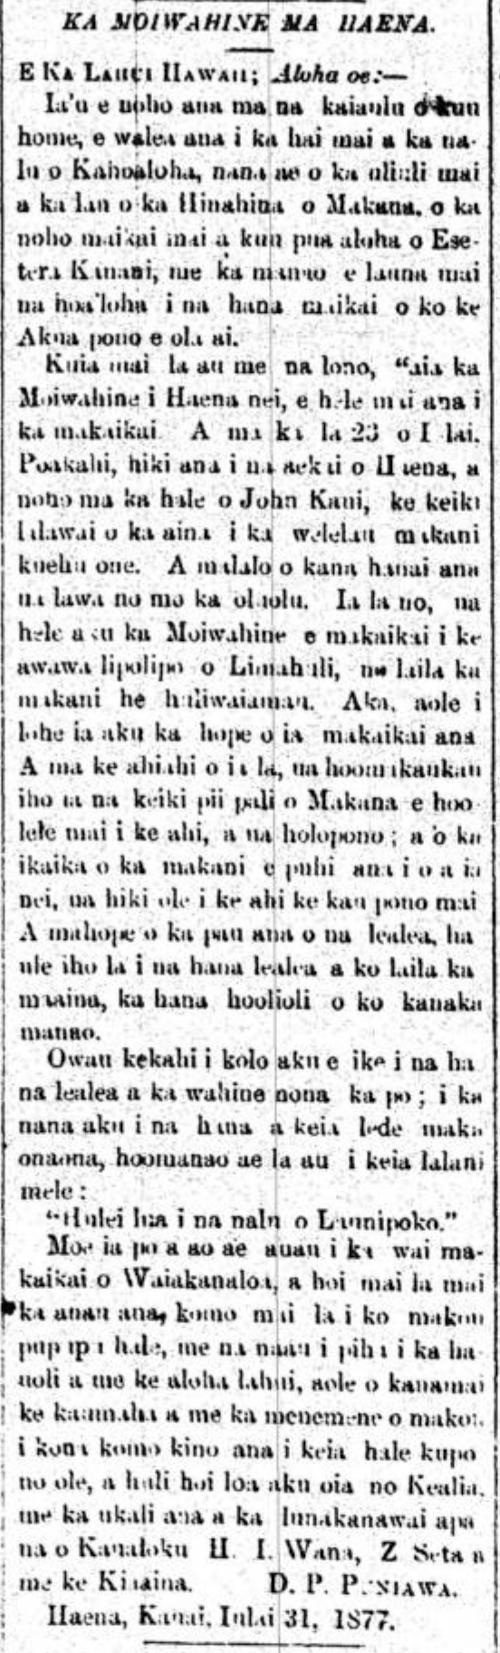 LahuiHawaii_8_23_1877_3